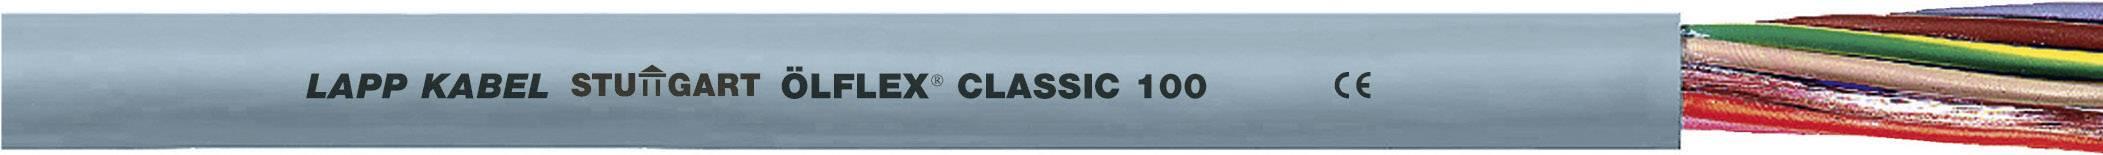 Kabel LappKabel Ölflex CLASSIC 100 21G0,5 (0010011), PVC, 11,7 mm, 500 V, šedá, 500 m